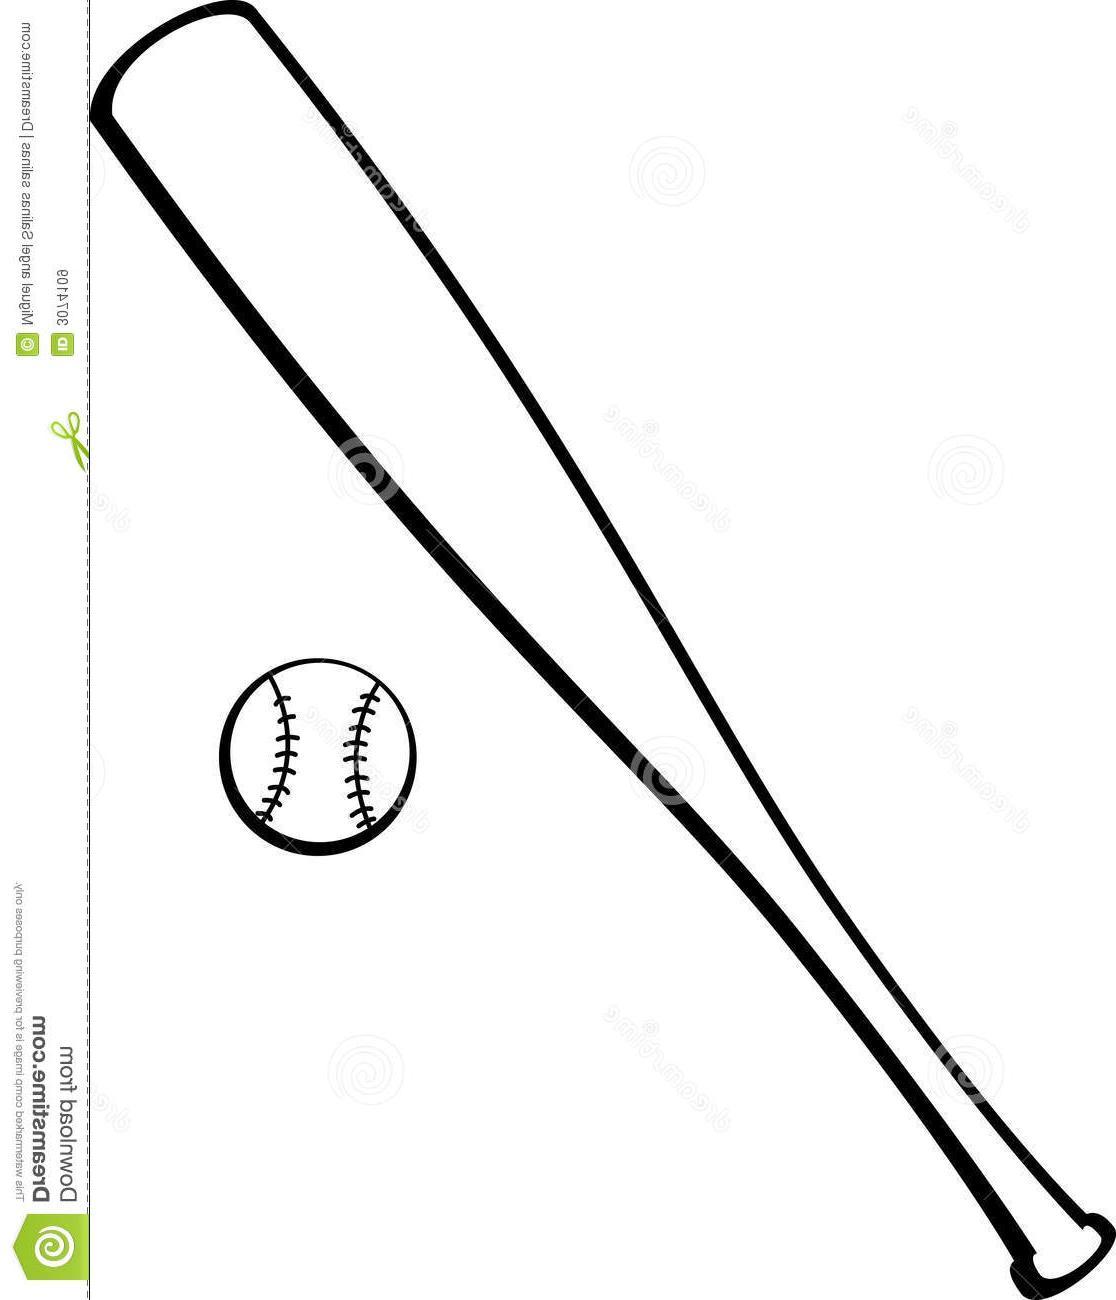 1116x1300 Hd Baseball Bat Outline Clip Art File Free Free Vector Art